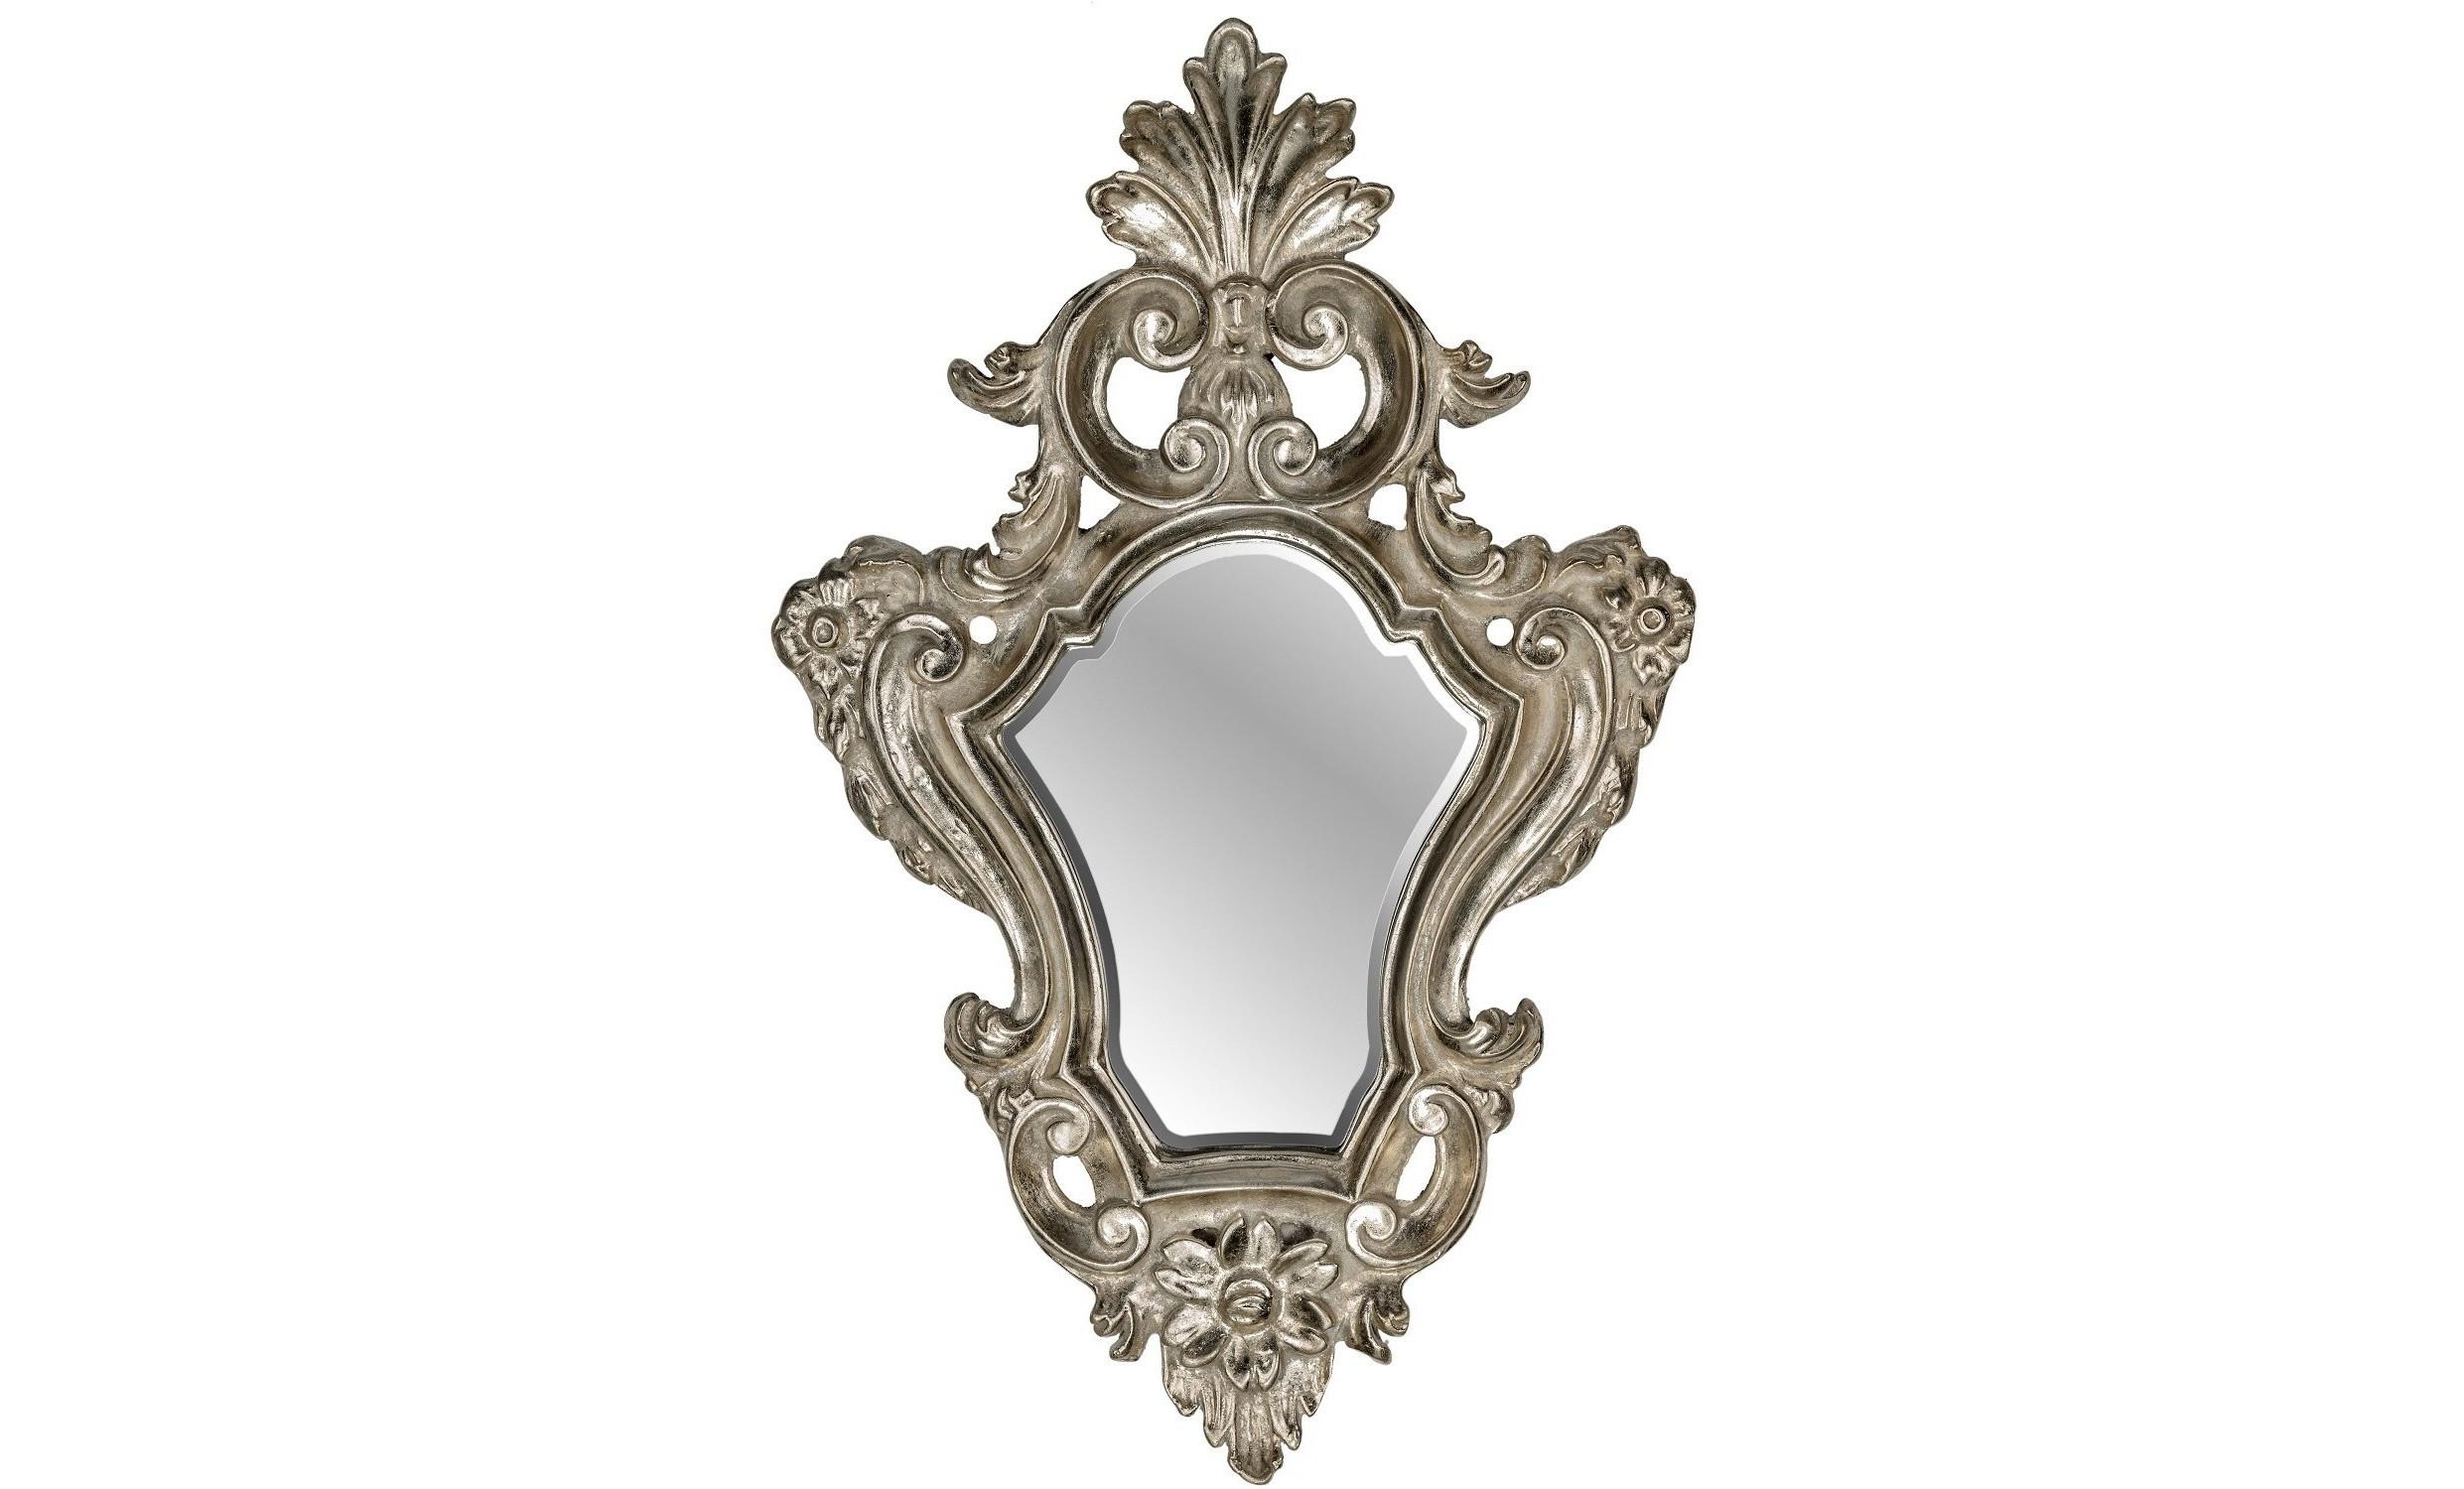 Зеркало Viola SilverНастенные зеркала<br><br><br>Material: Полирезин<br>Ширина см: 27.5<br>Высота см: 48.5<br>Глубина см: 4.0